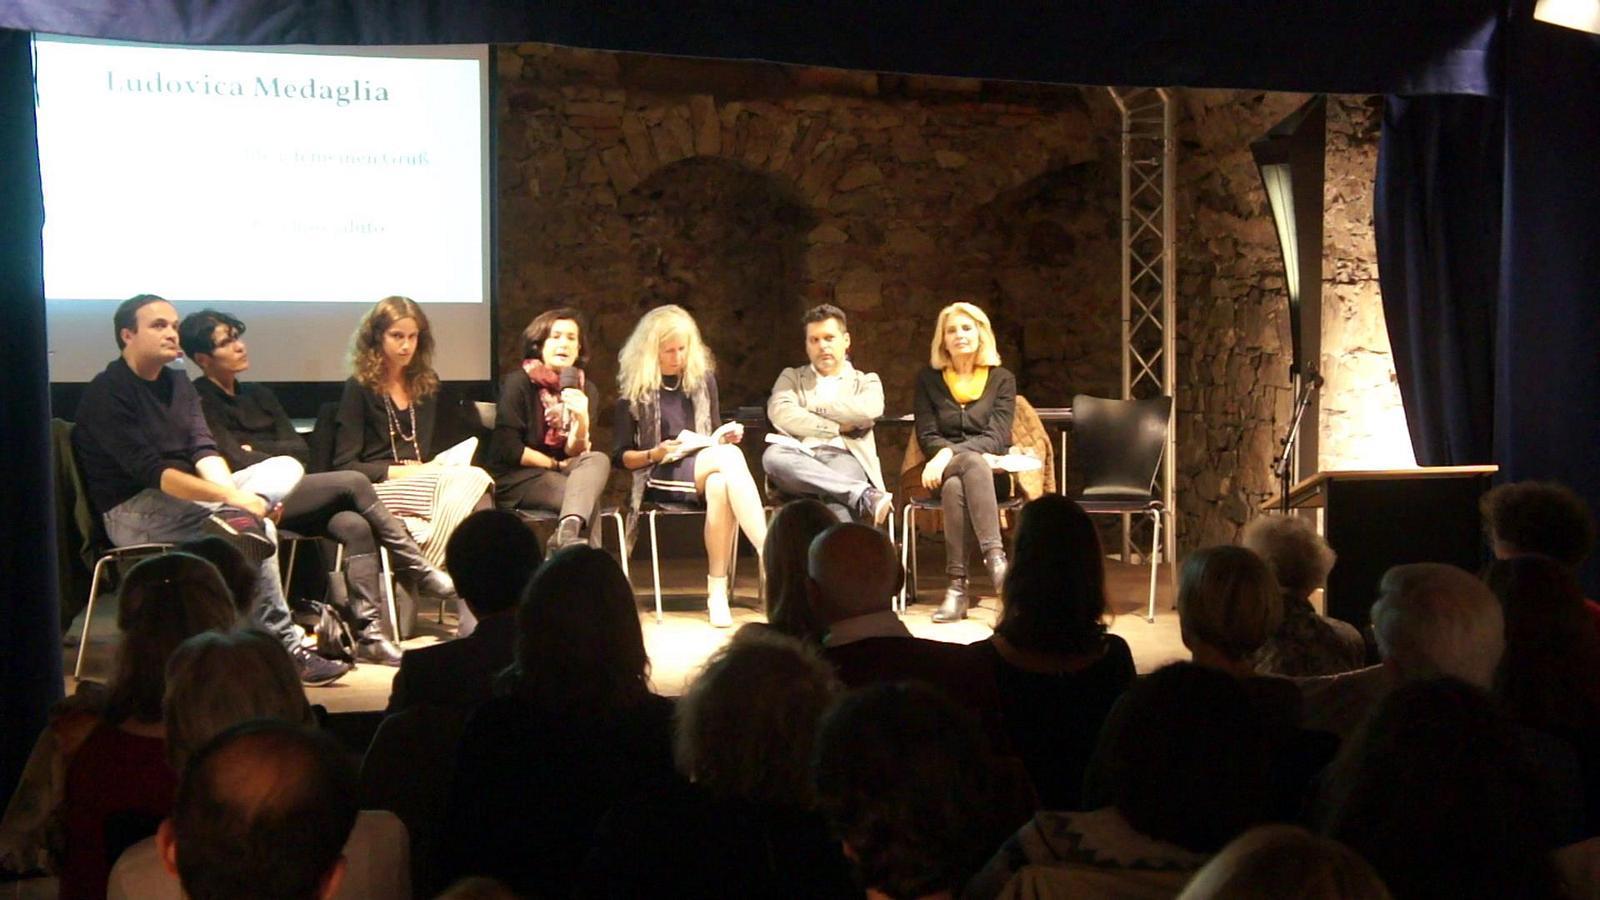 Irene Pacini übersetzt Ludovica Medaglia